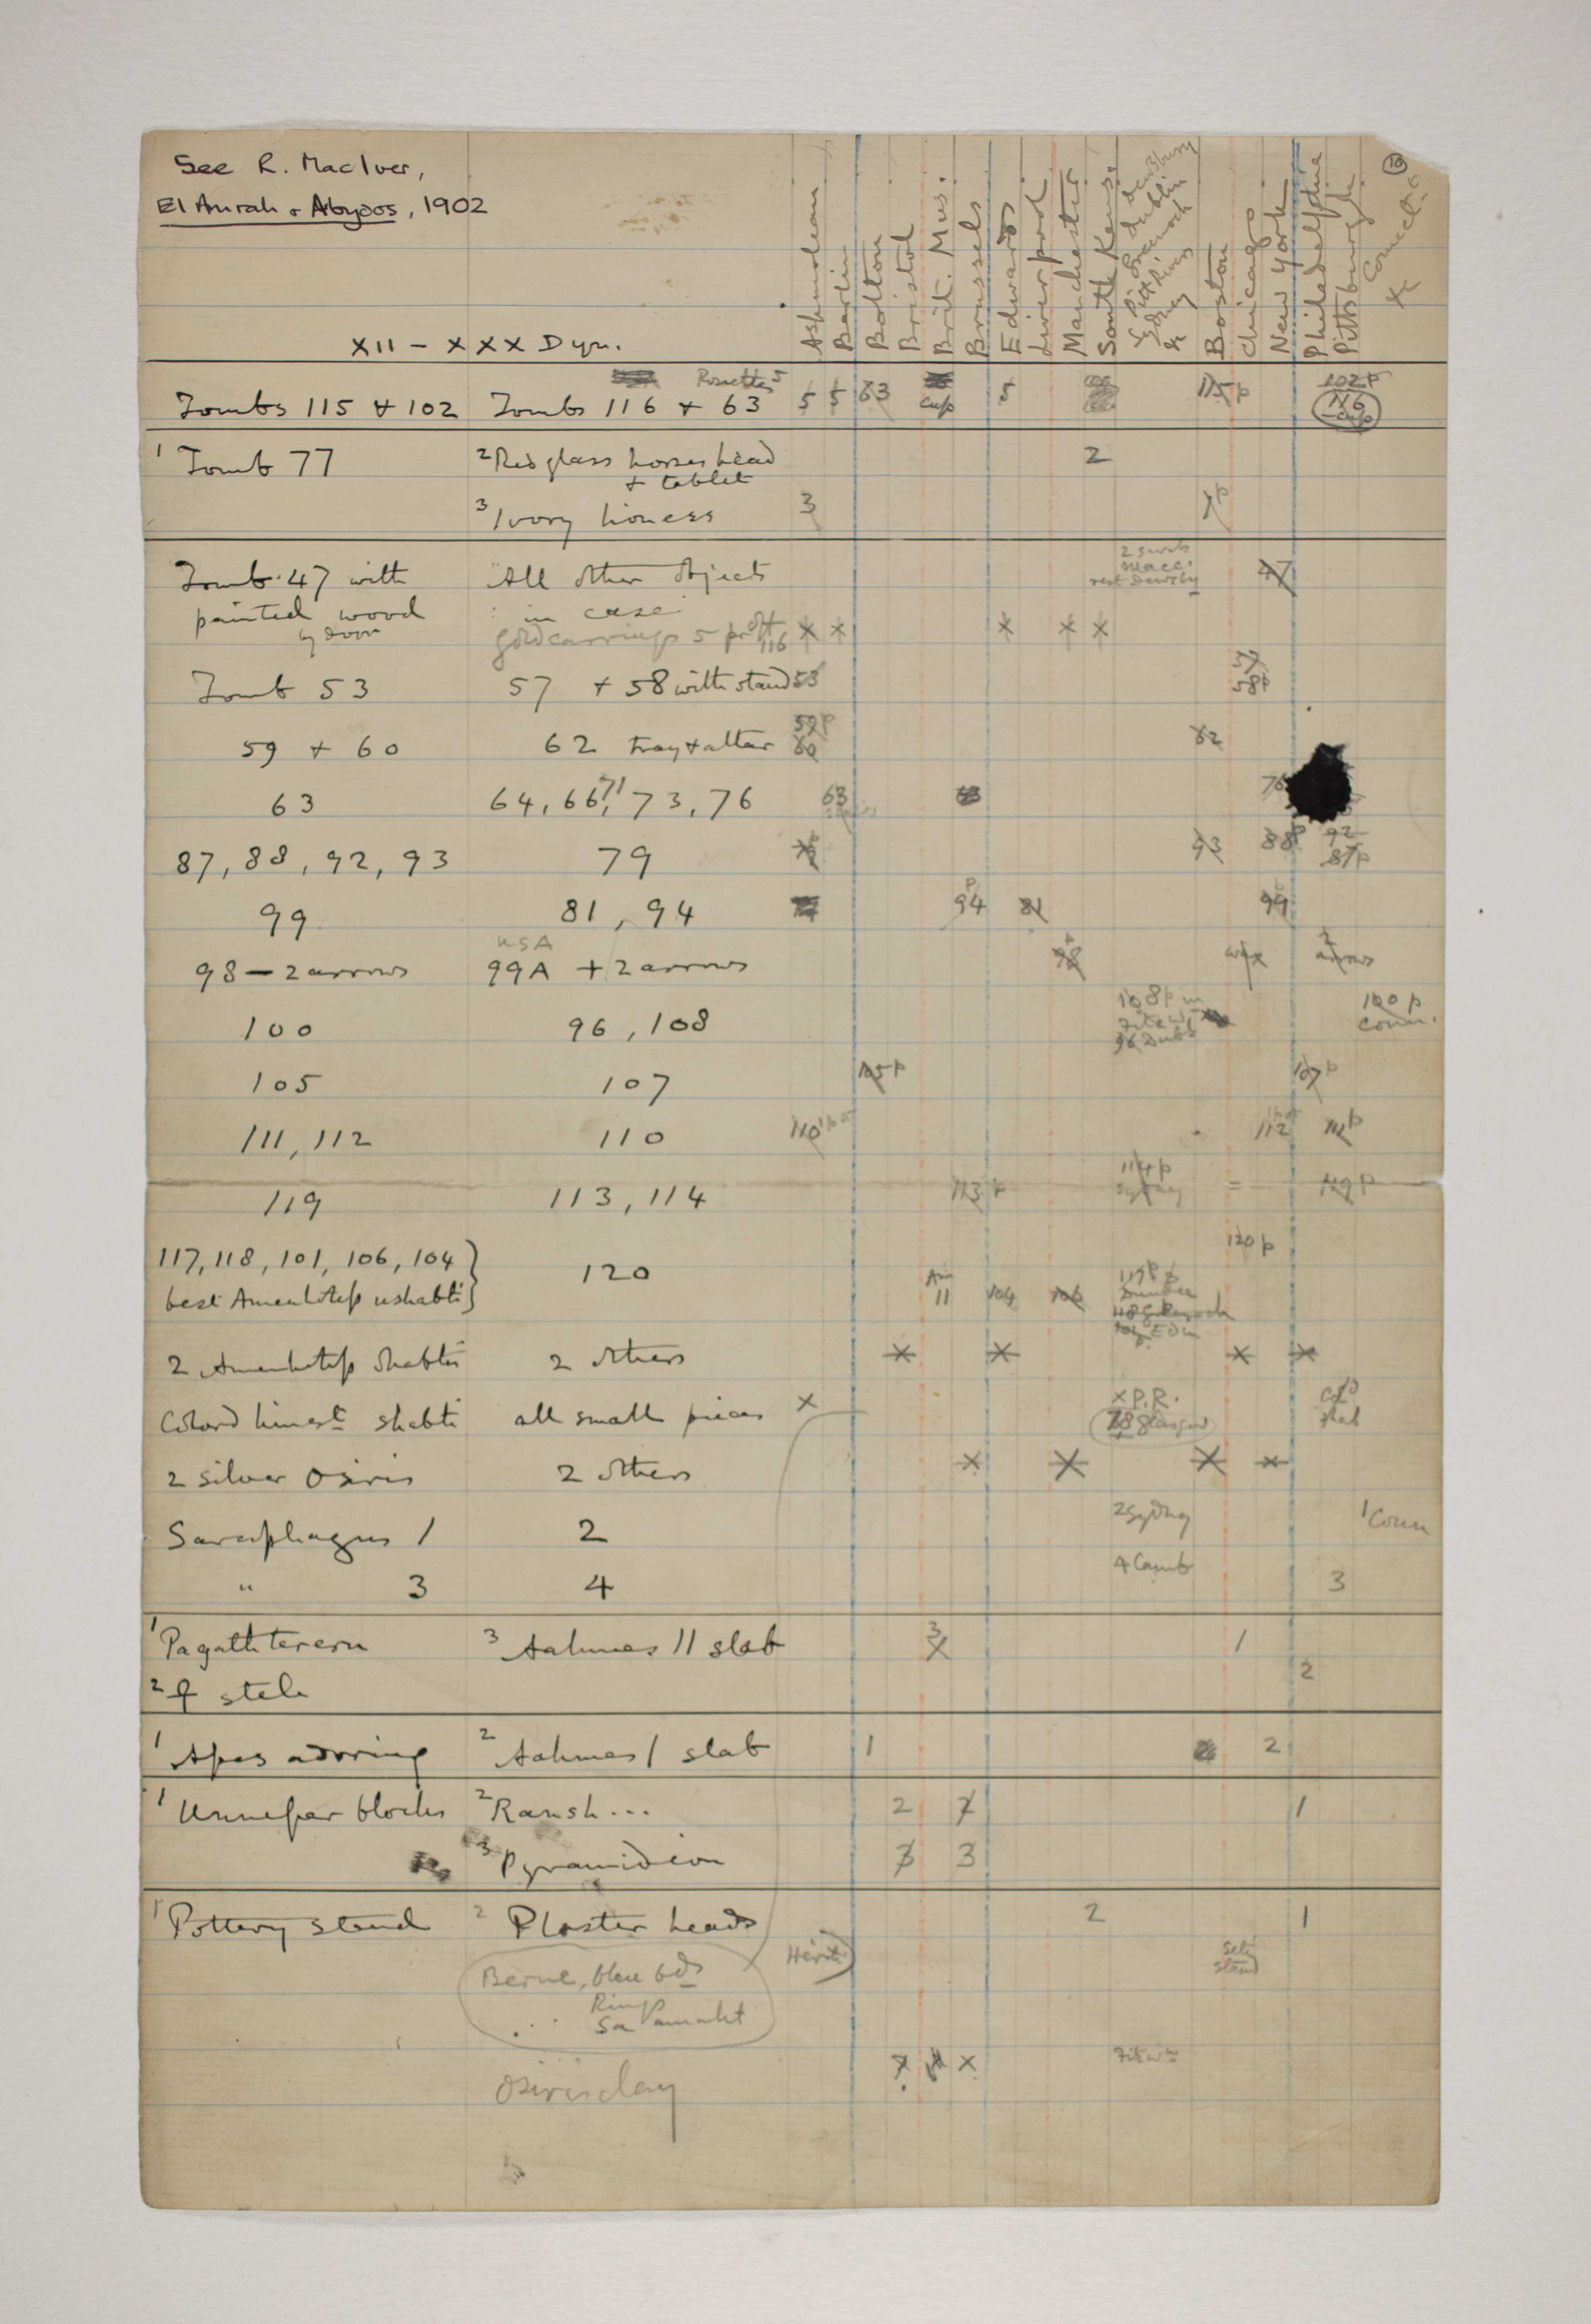 1900-01 Abydos, Bet Khallaf, el-Mahasna Distribution grid PMA/WFP1/D/9/10.1